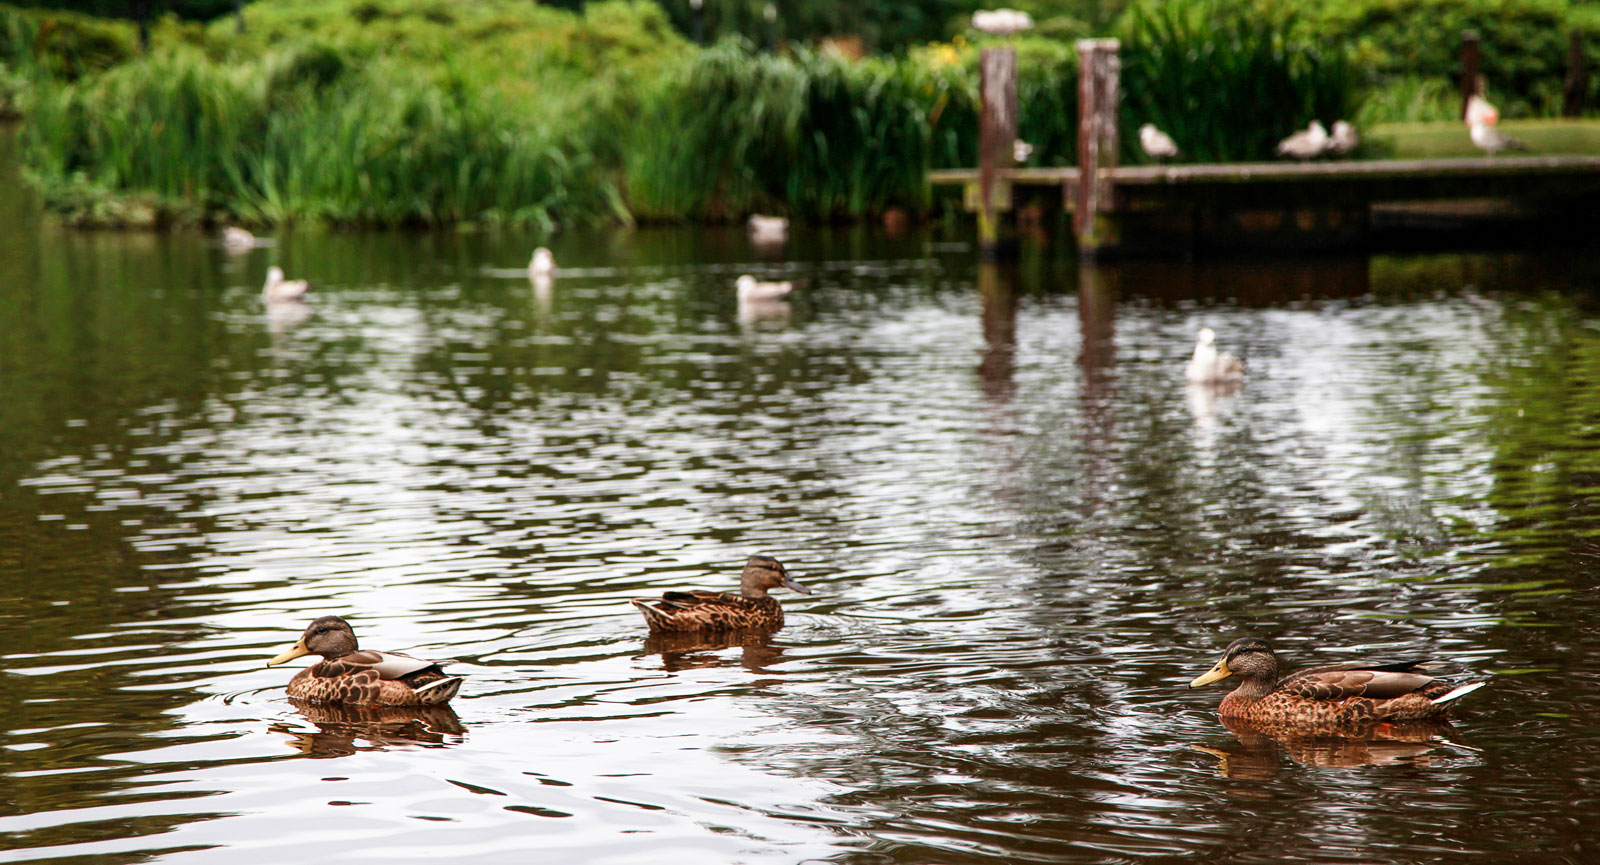 Flera gräsänder simmar i dammen närmast entrén.